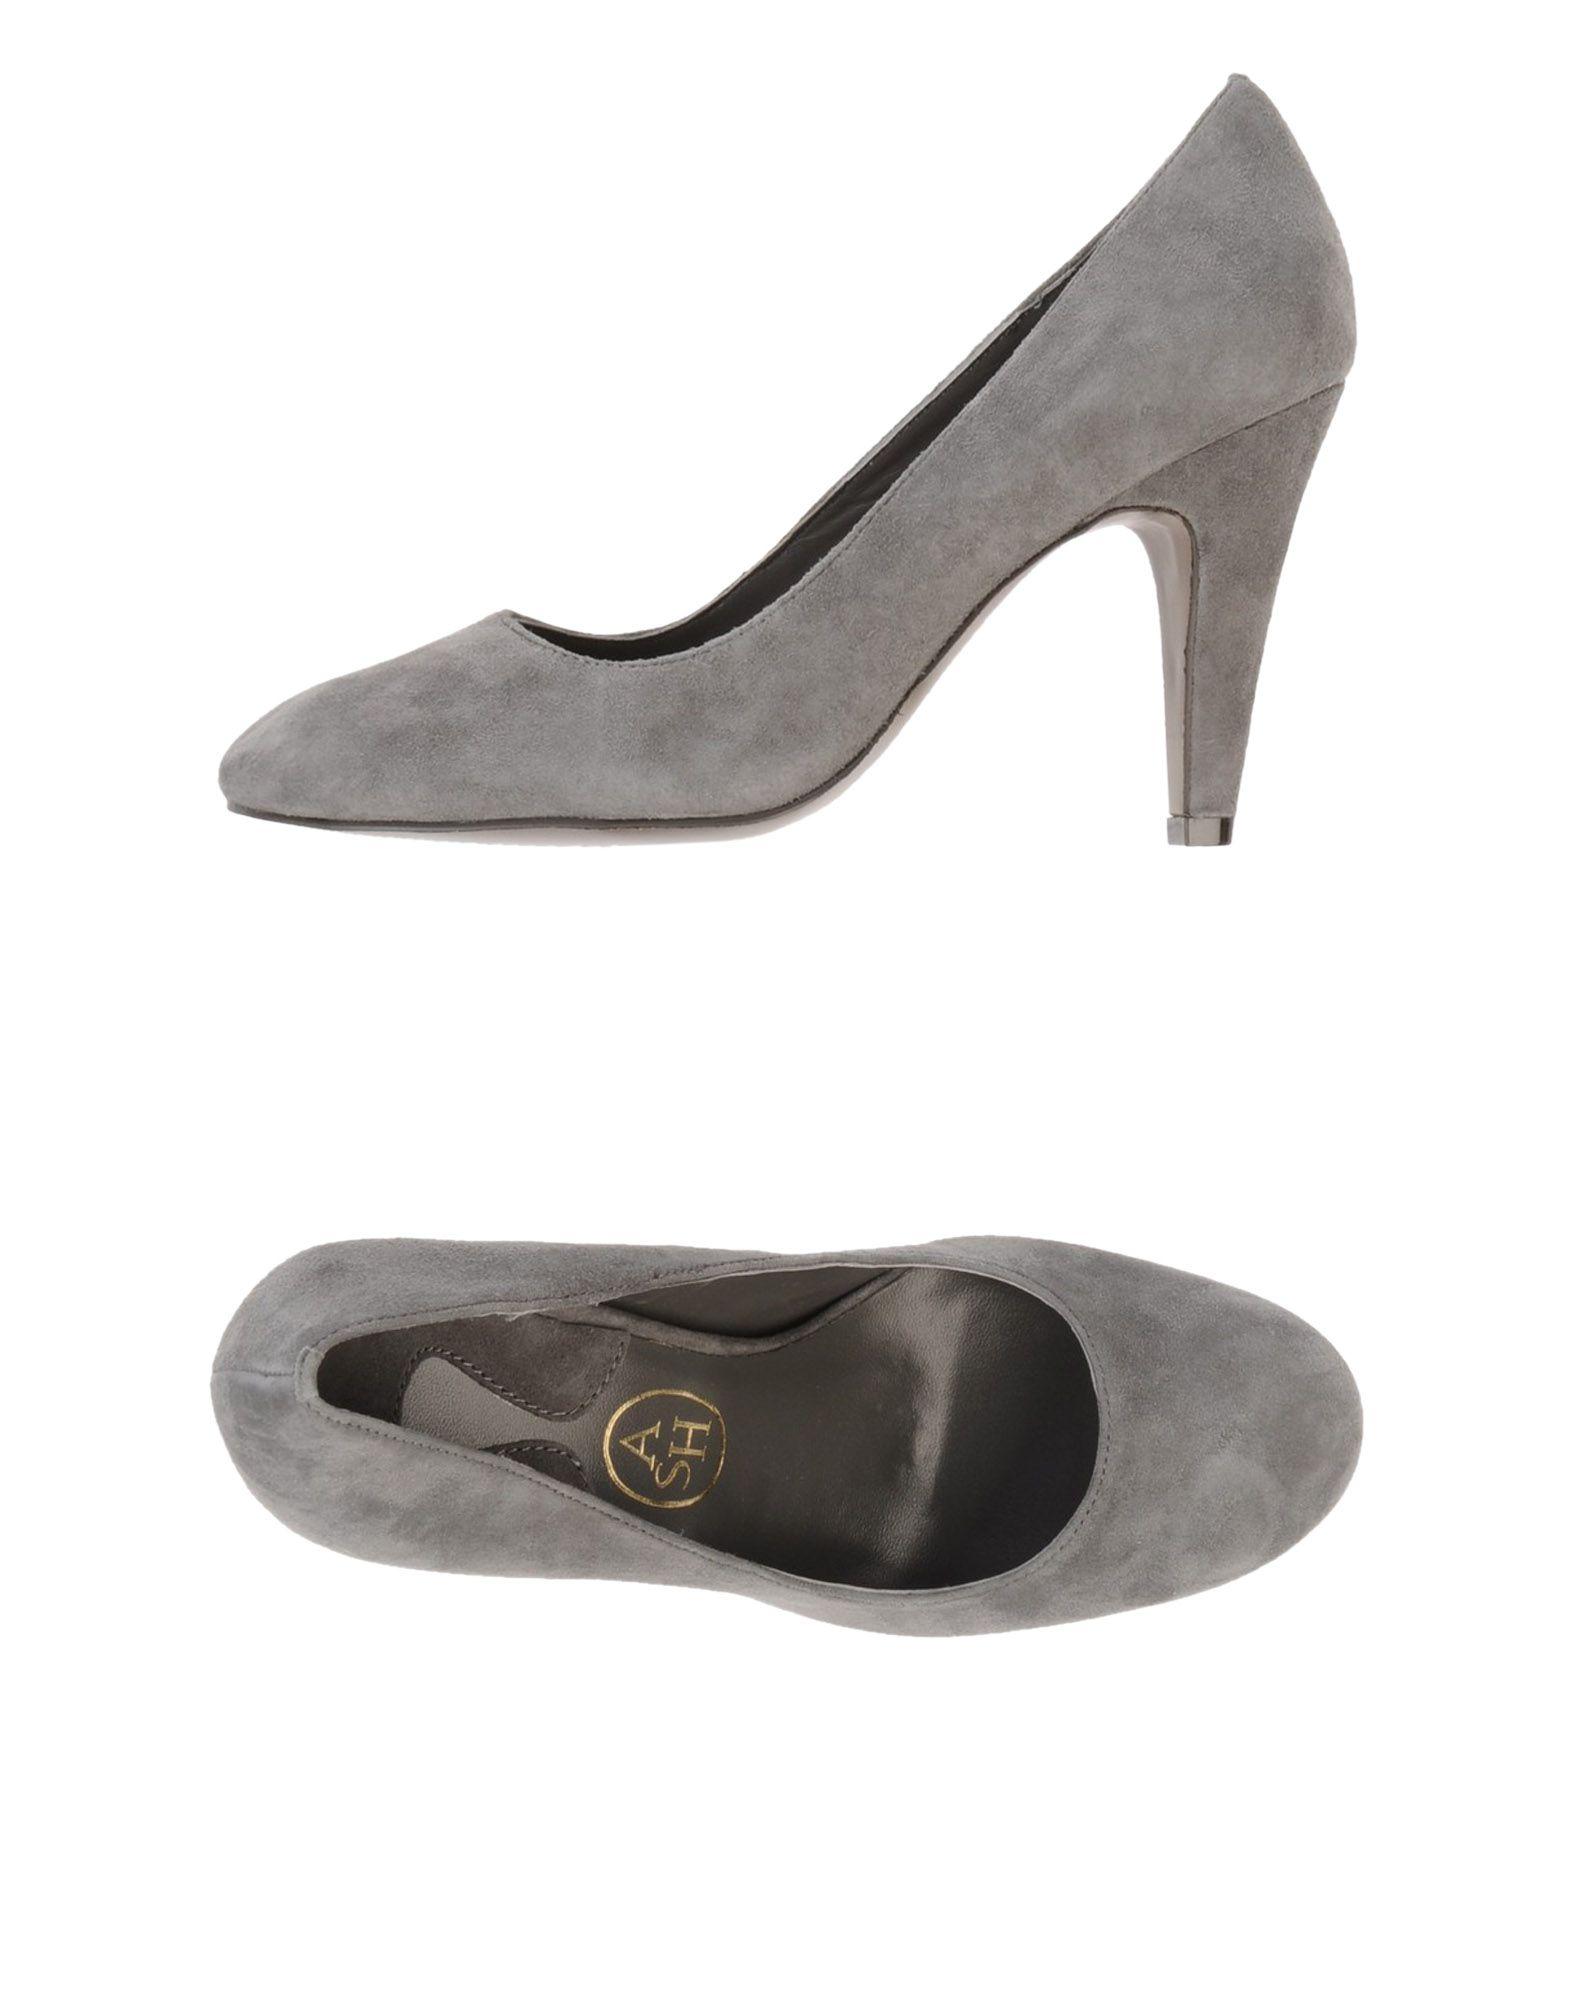 Foto Ash Zapatos De SalóN Mujer Gris foto 690551 3a0b6d0e53a5